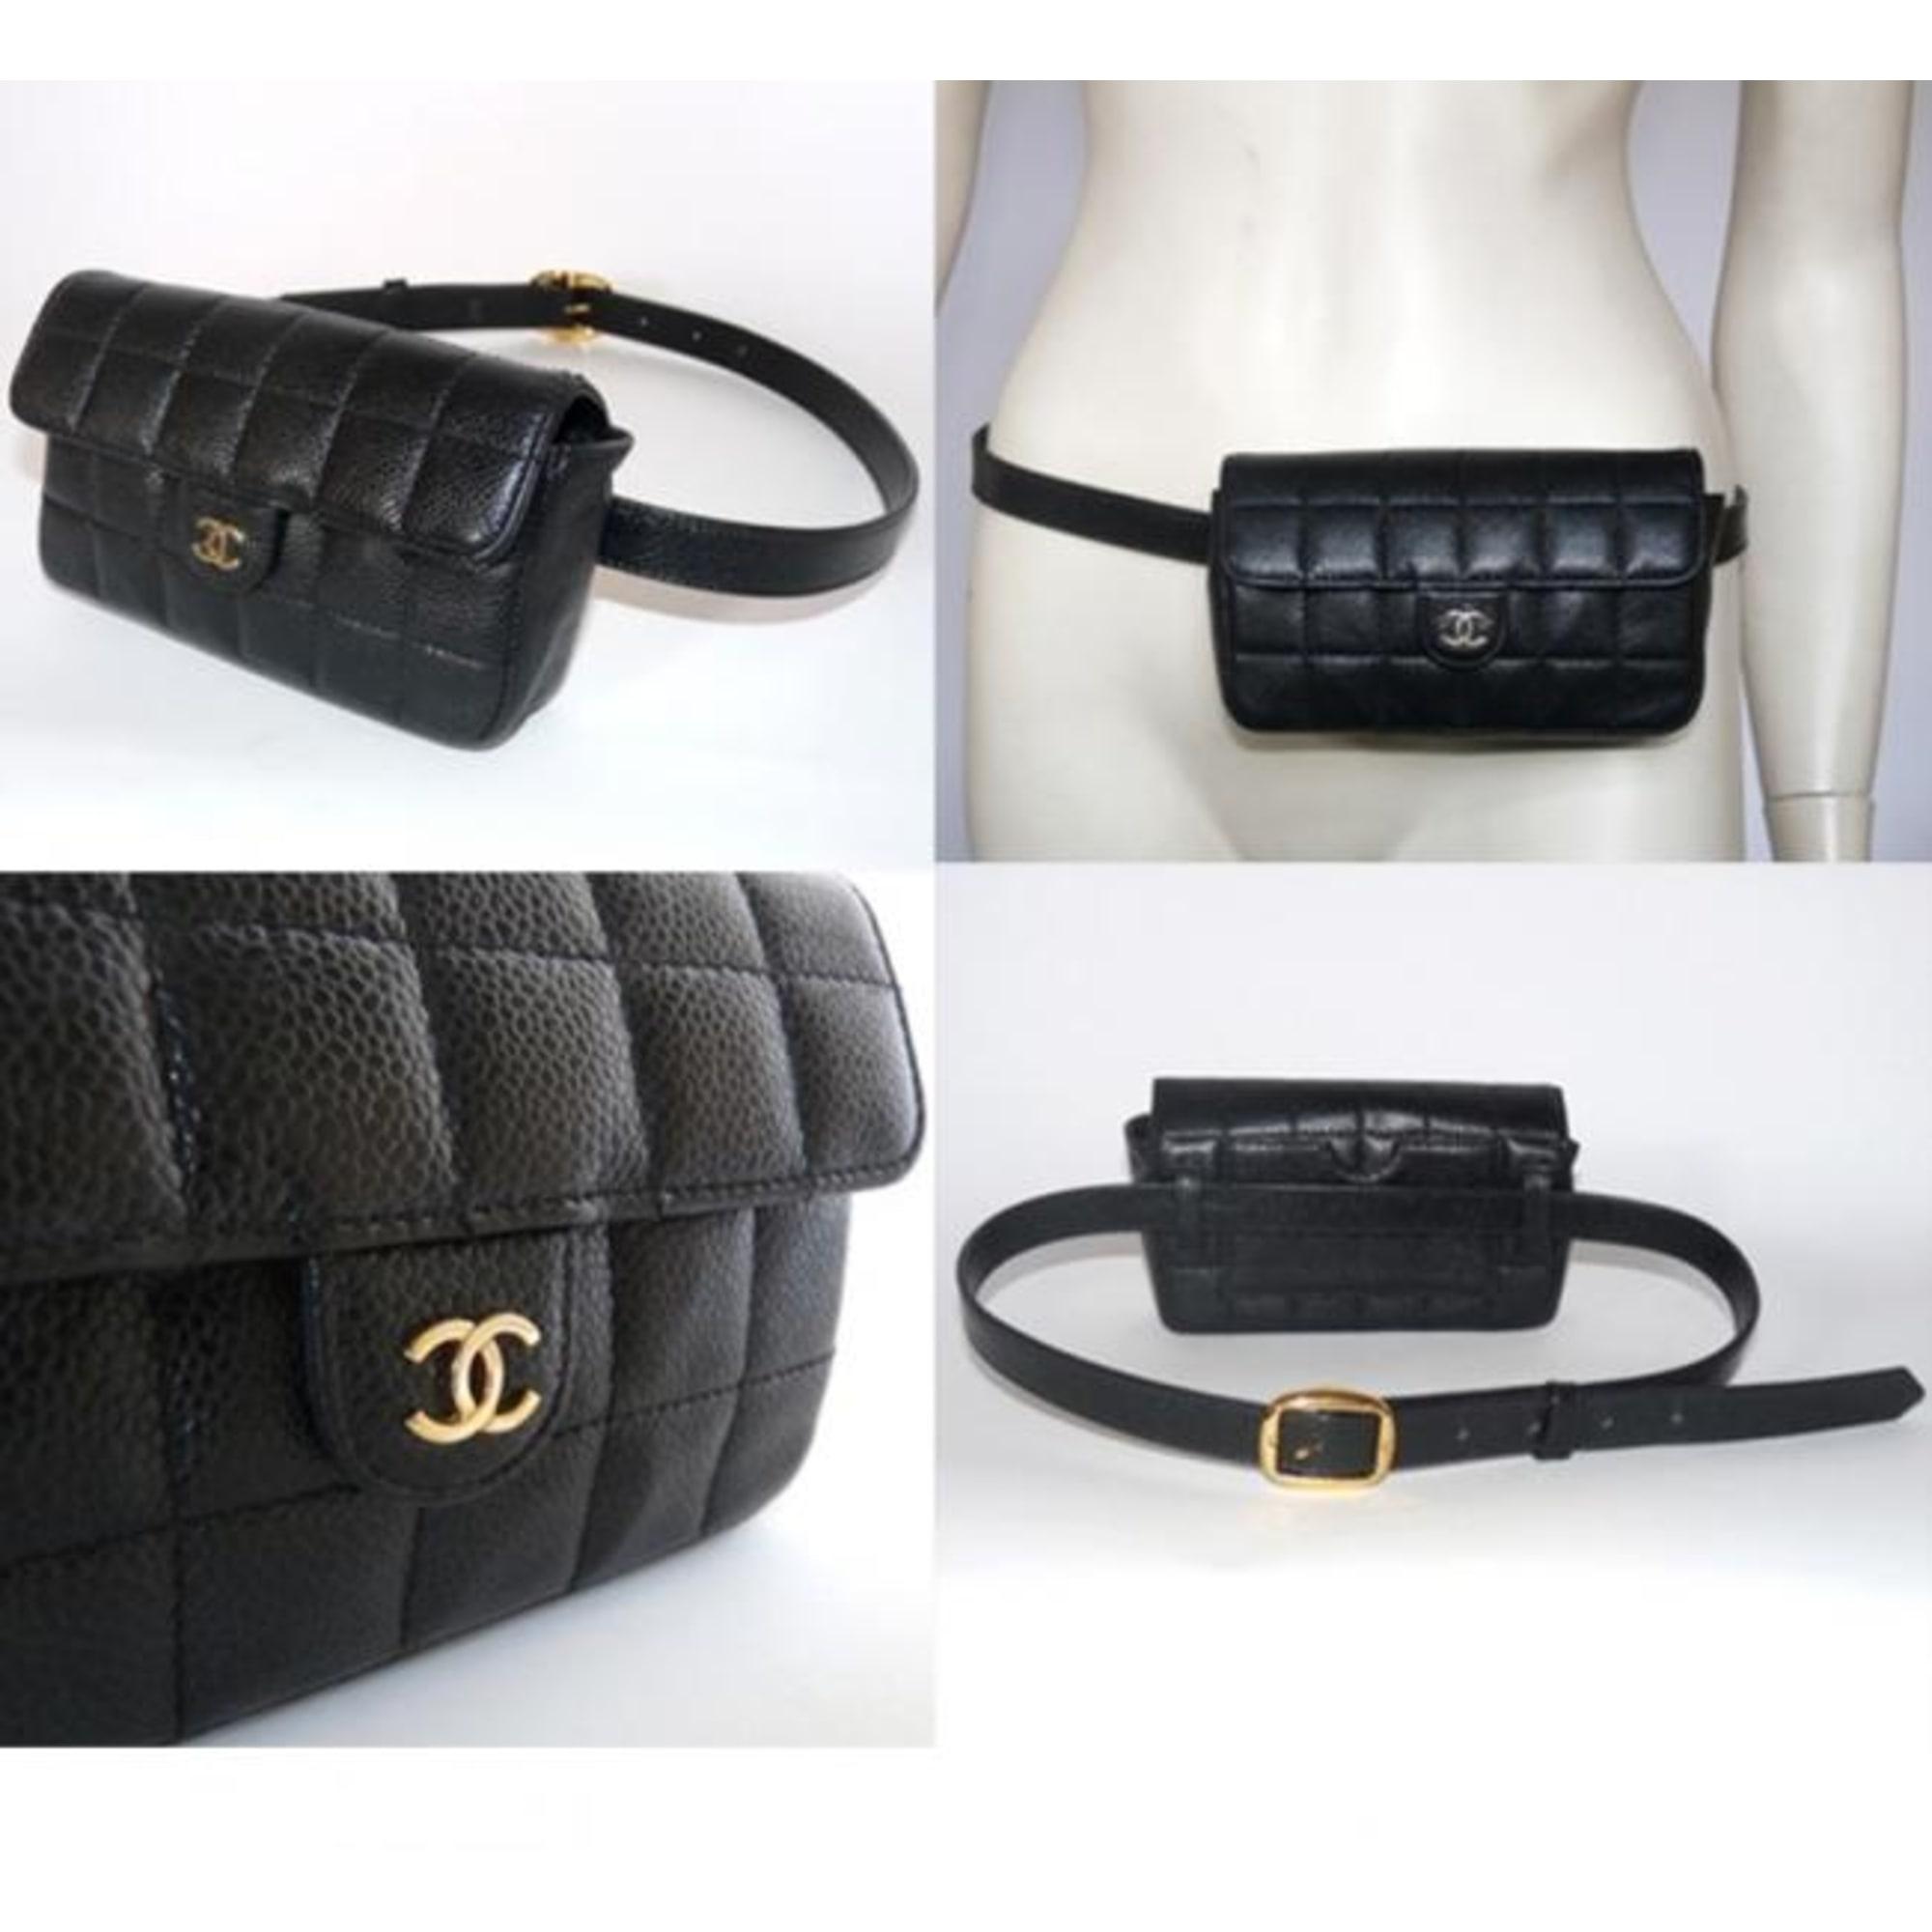 Sac pochette en cuir CHANEL noir vendu par D-bi-d-bo47418 - 186128 e0104ec302b